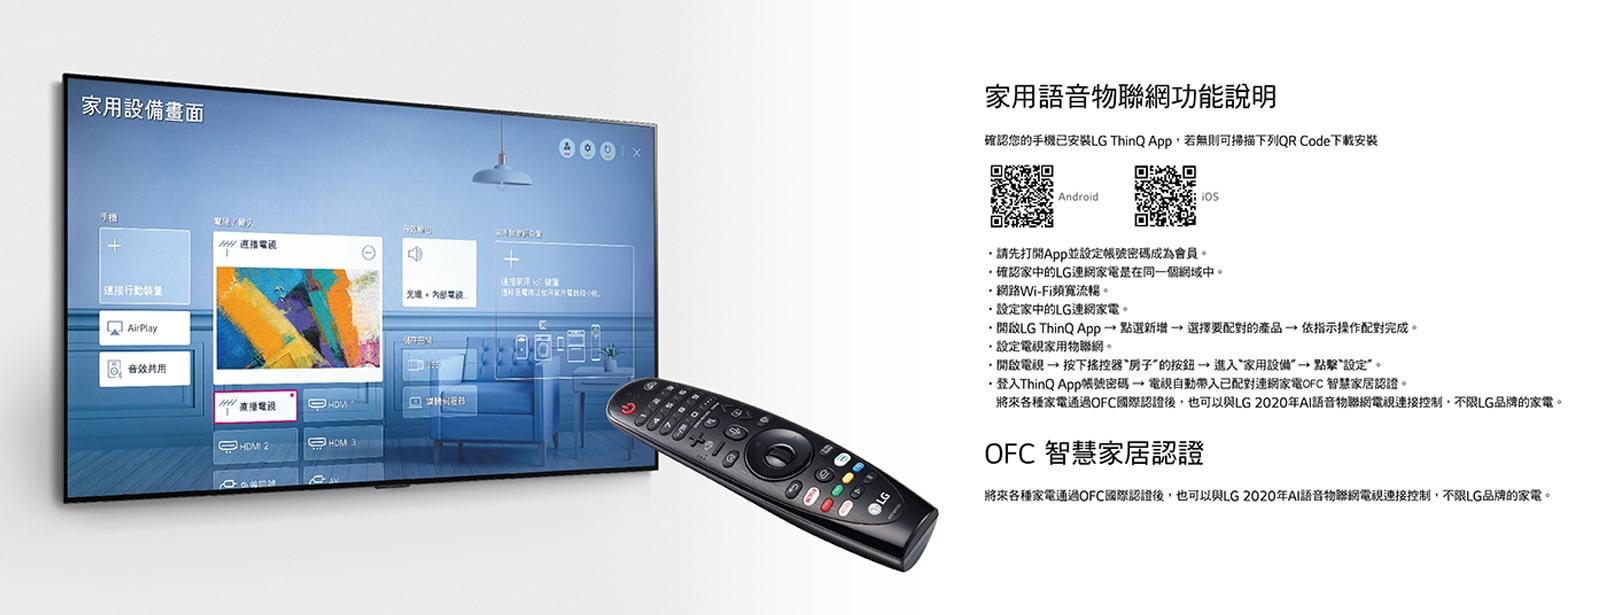 D05_2020-OLED-TV_Leaflet_cover-18_FA_0430_ol_P13-14-D